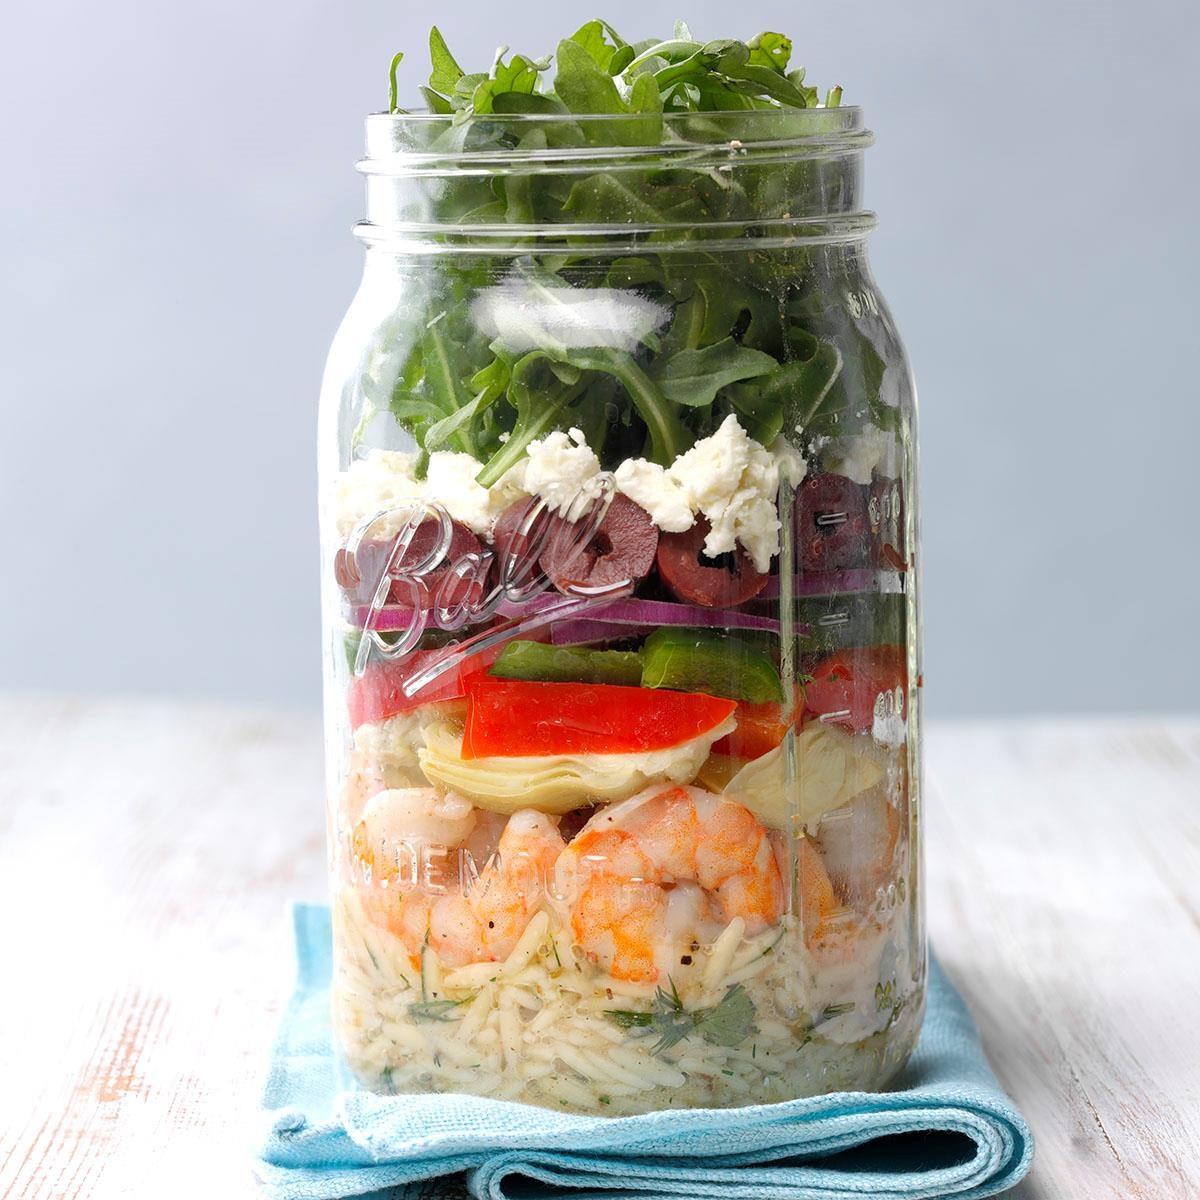 Mediterranean Shrimp Salad in a Jar